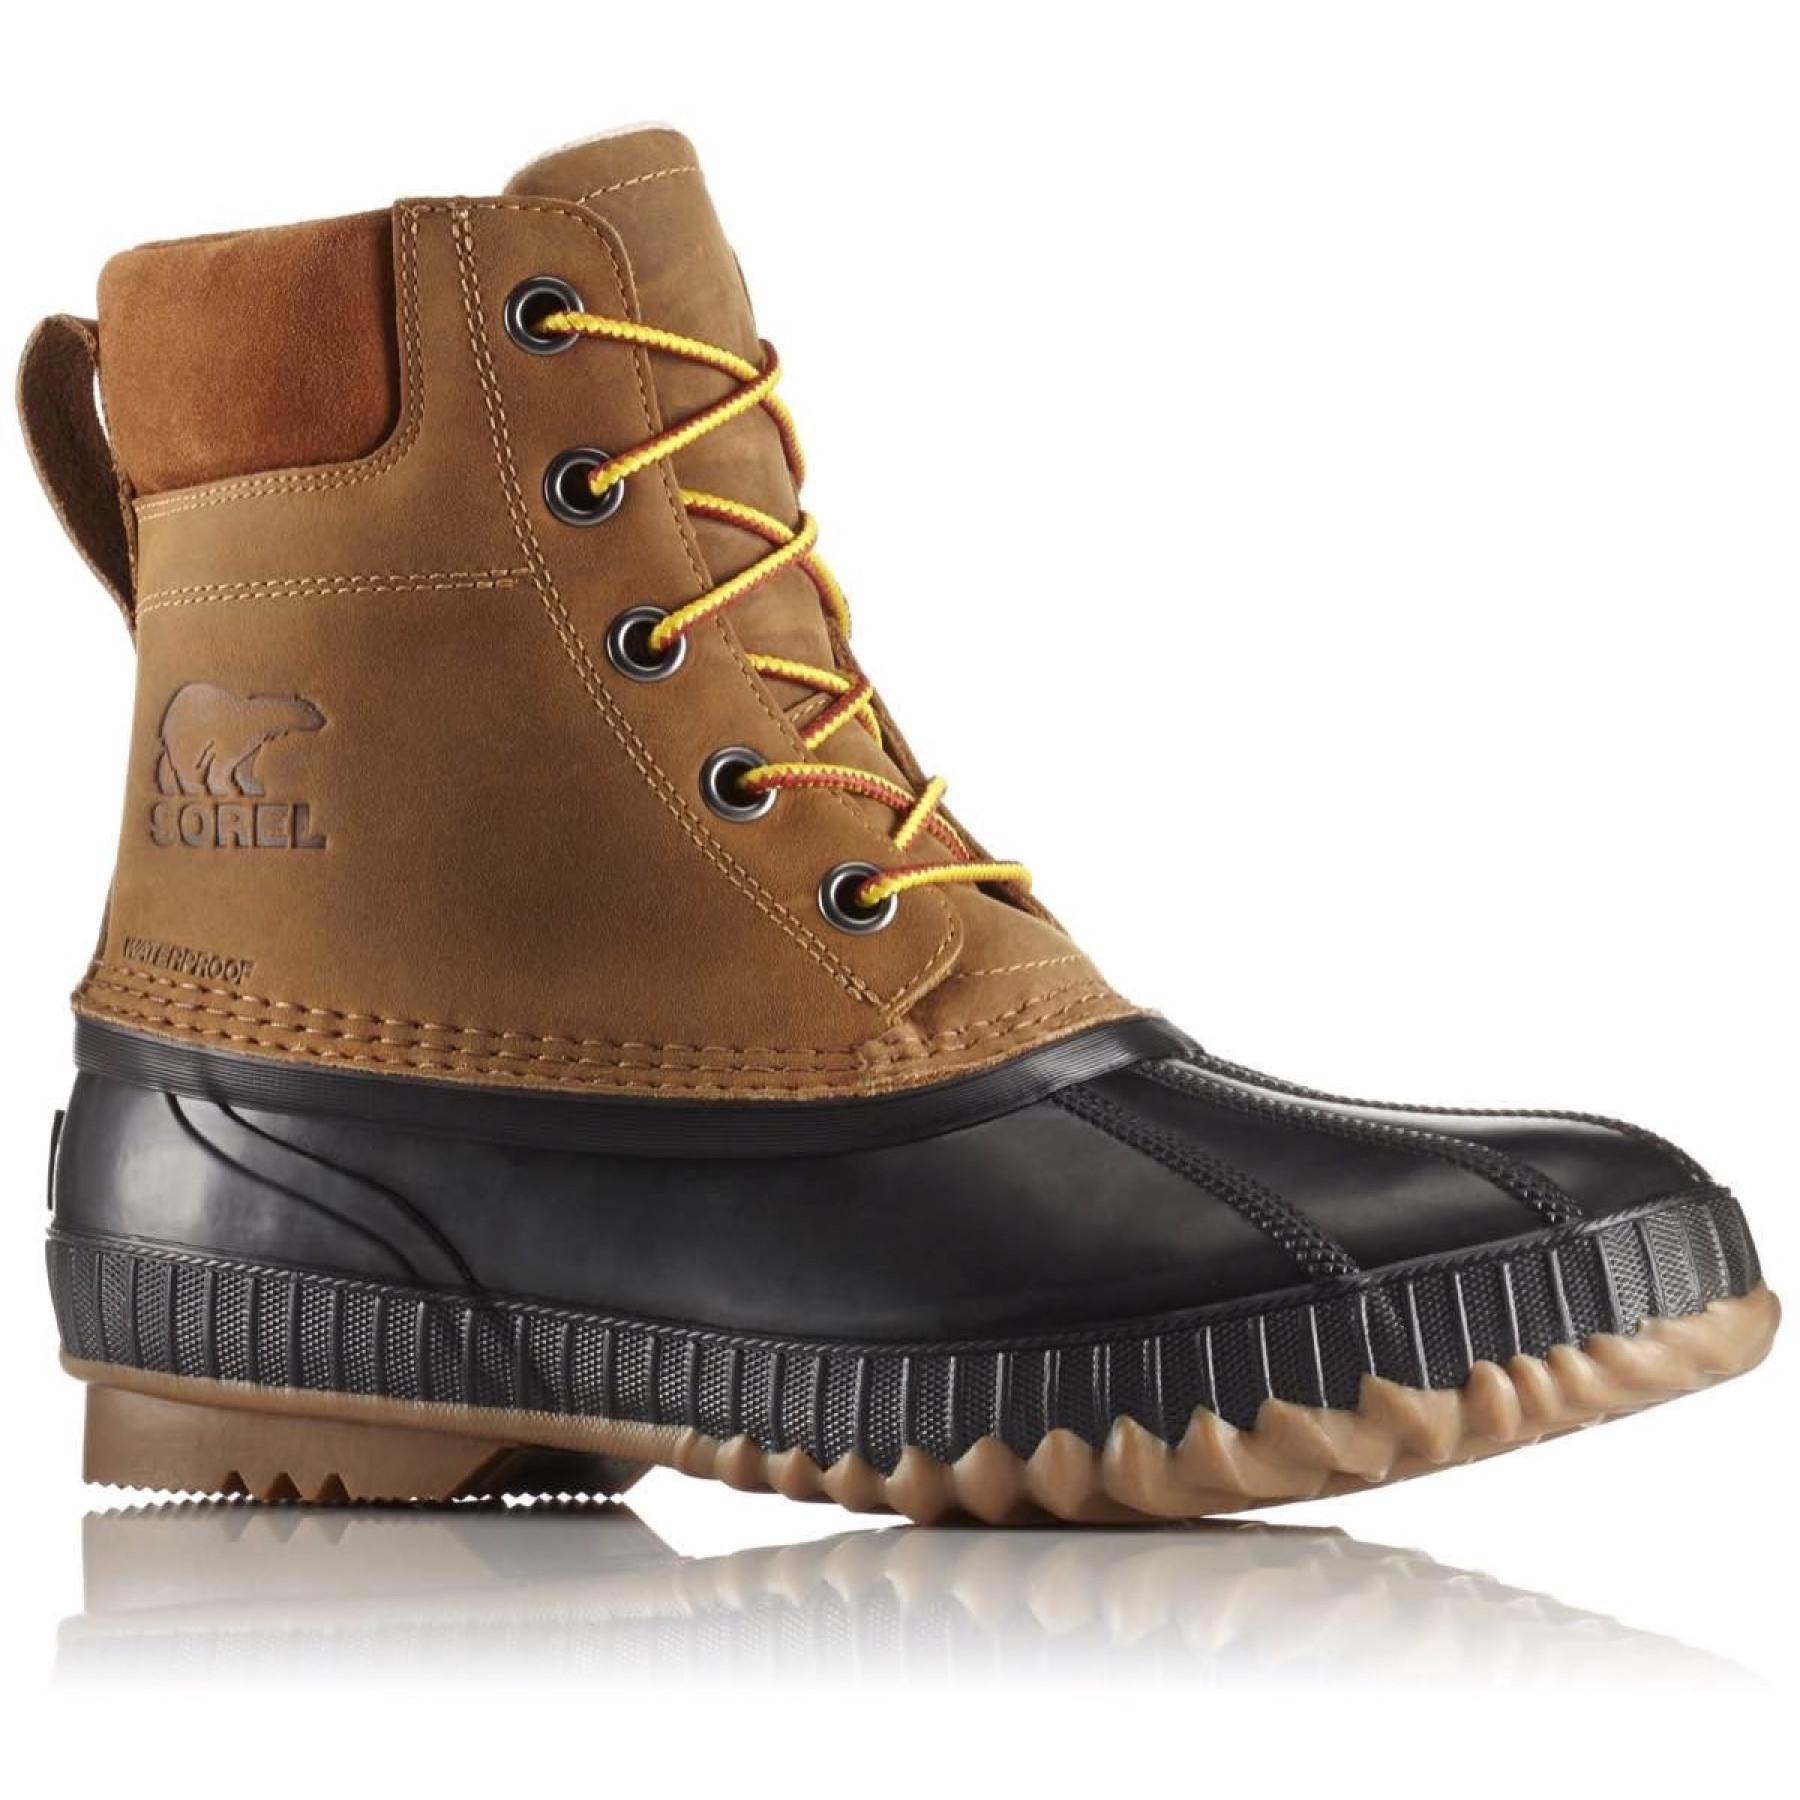 7426a7a98 Sorel - vintersko og støvler til rufsete vær | Fjellsport.no